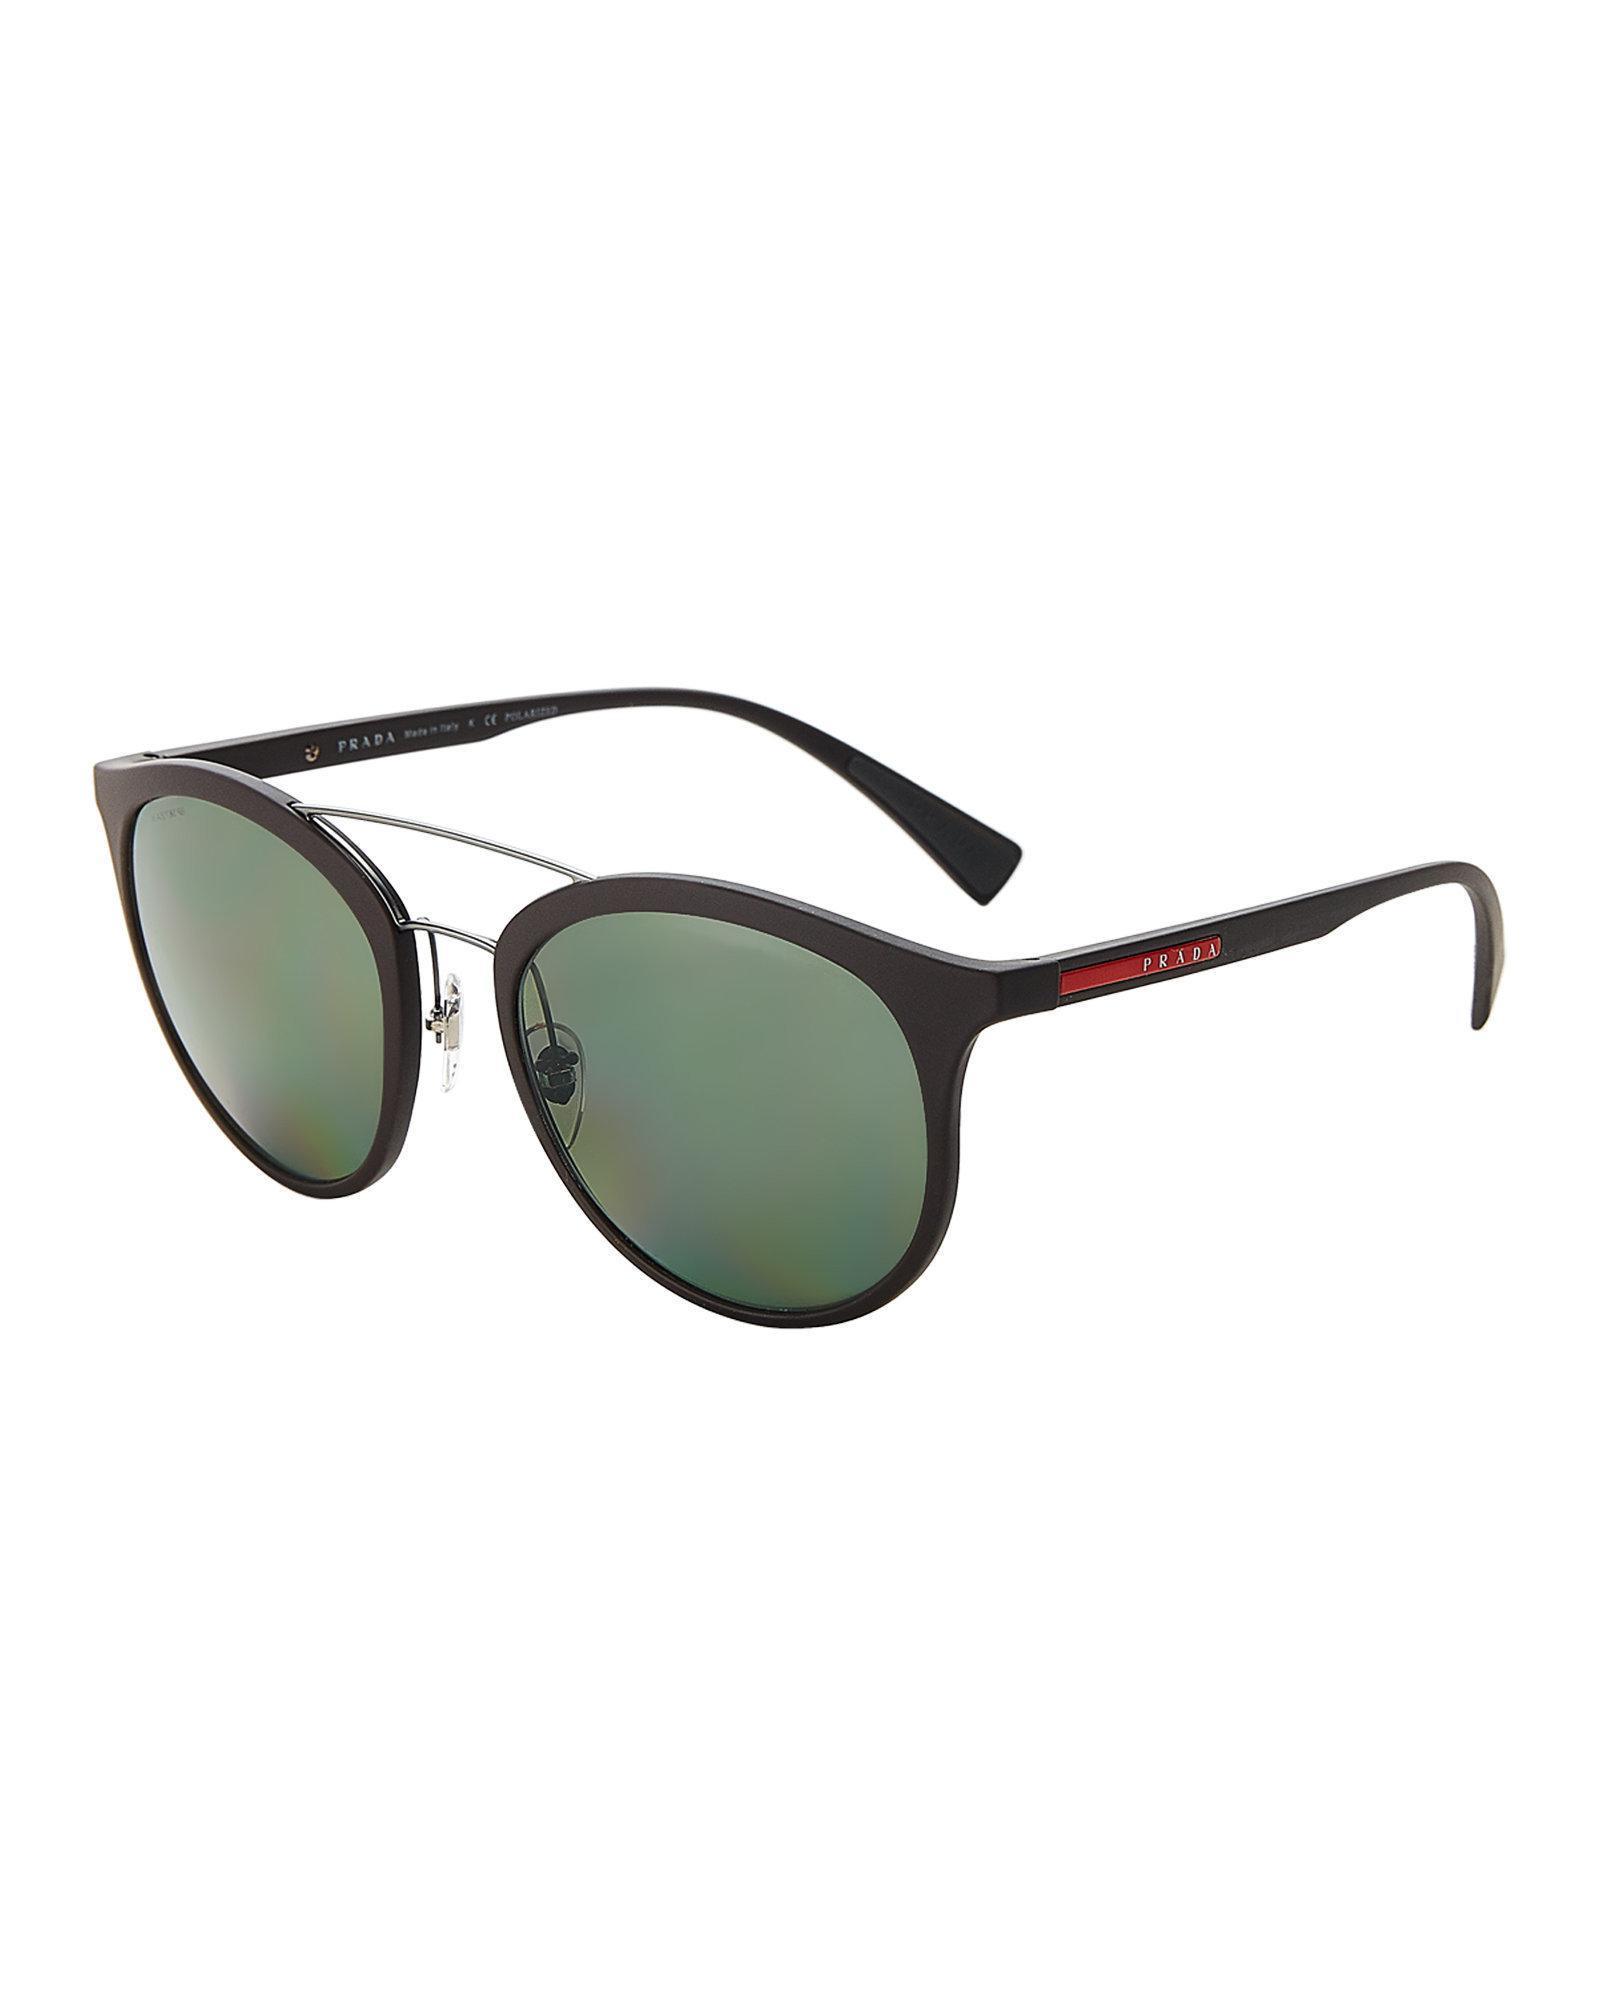 01106a4f4c Lyst - Prada Sport Sps 04s Black Round Sunglasses in Black for Men